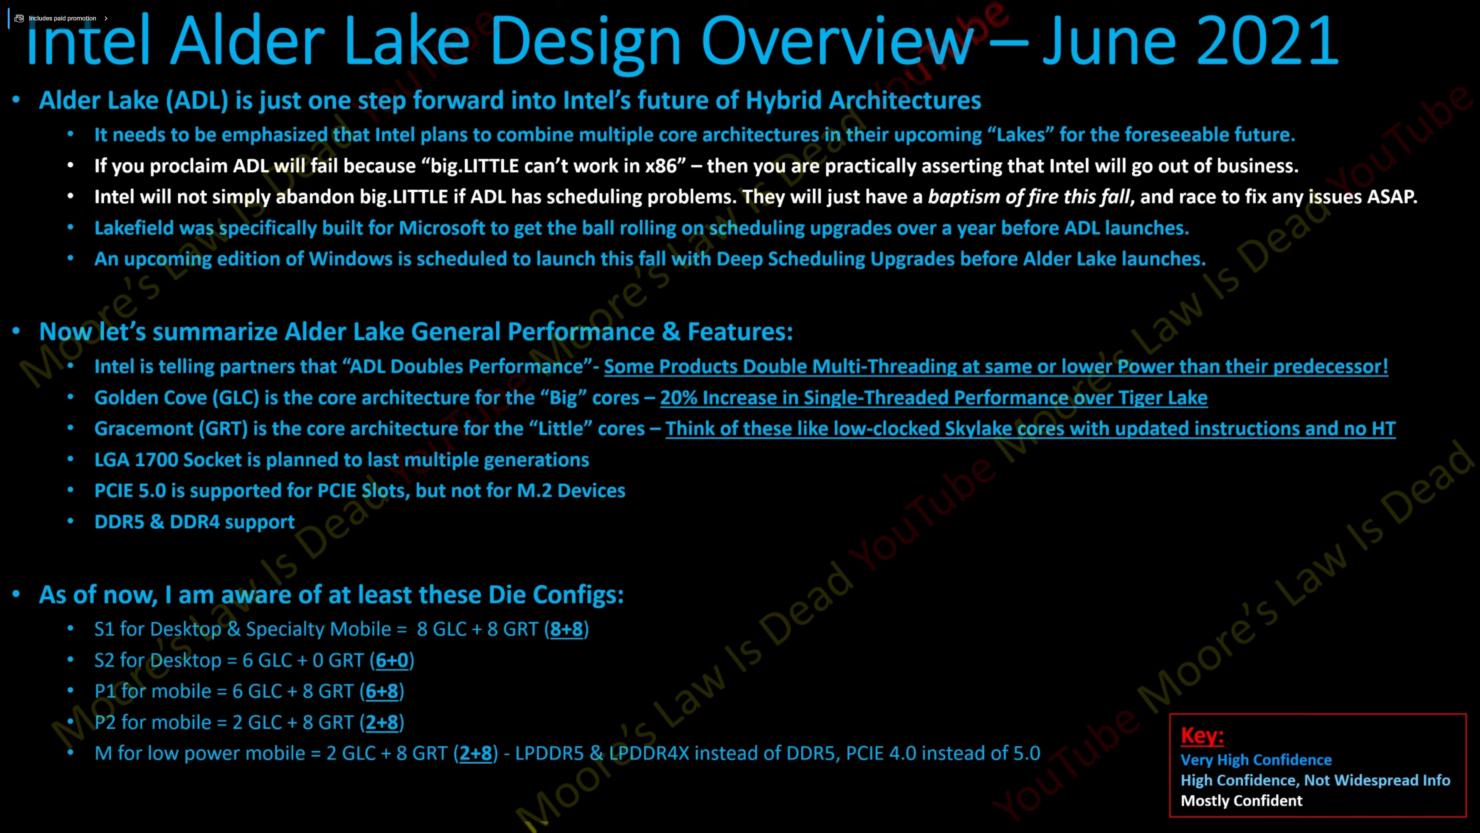 intel-12th-gen-alder-lake-13th-gen-raptor-lake-desktop-mobility-cpu-rumors-_1